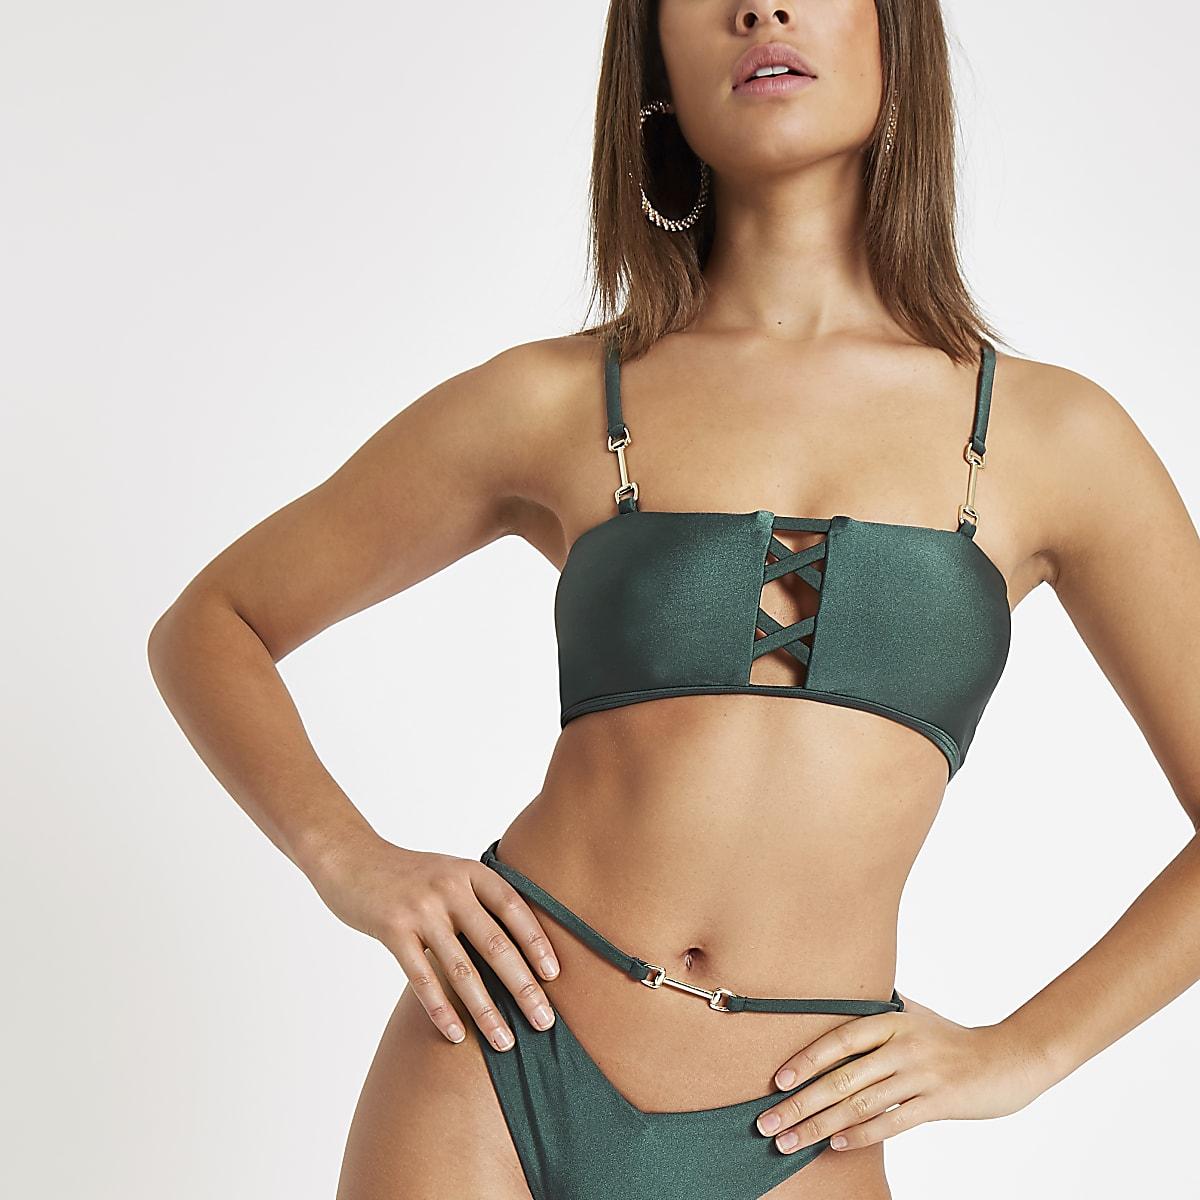 Groene bikinitop met vetersluiting aan de voorkant